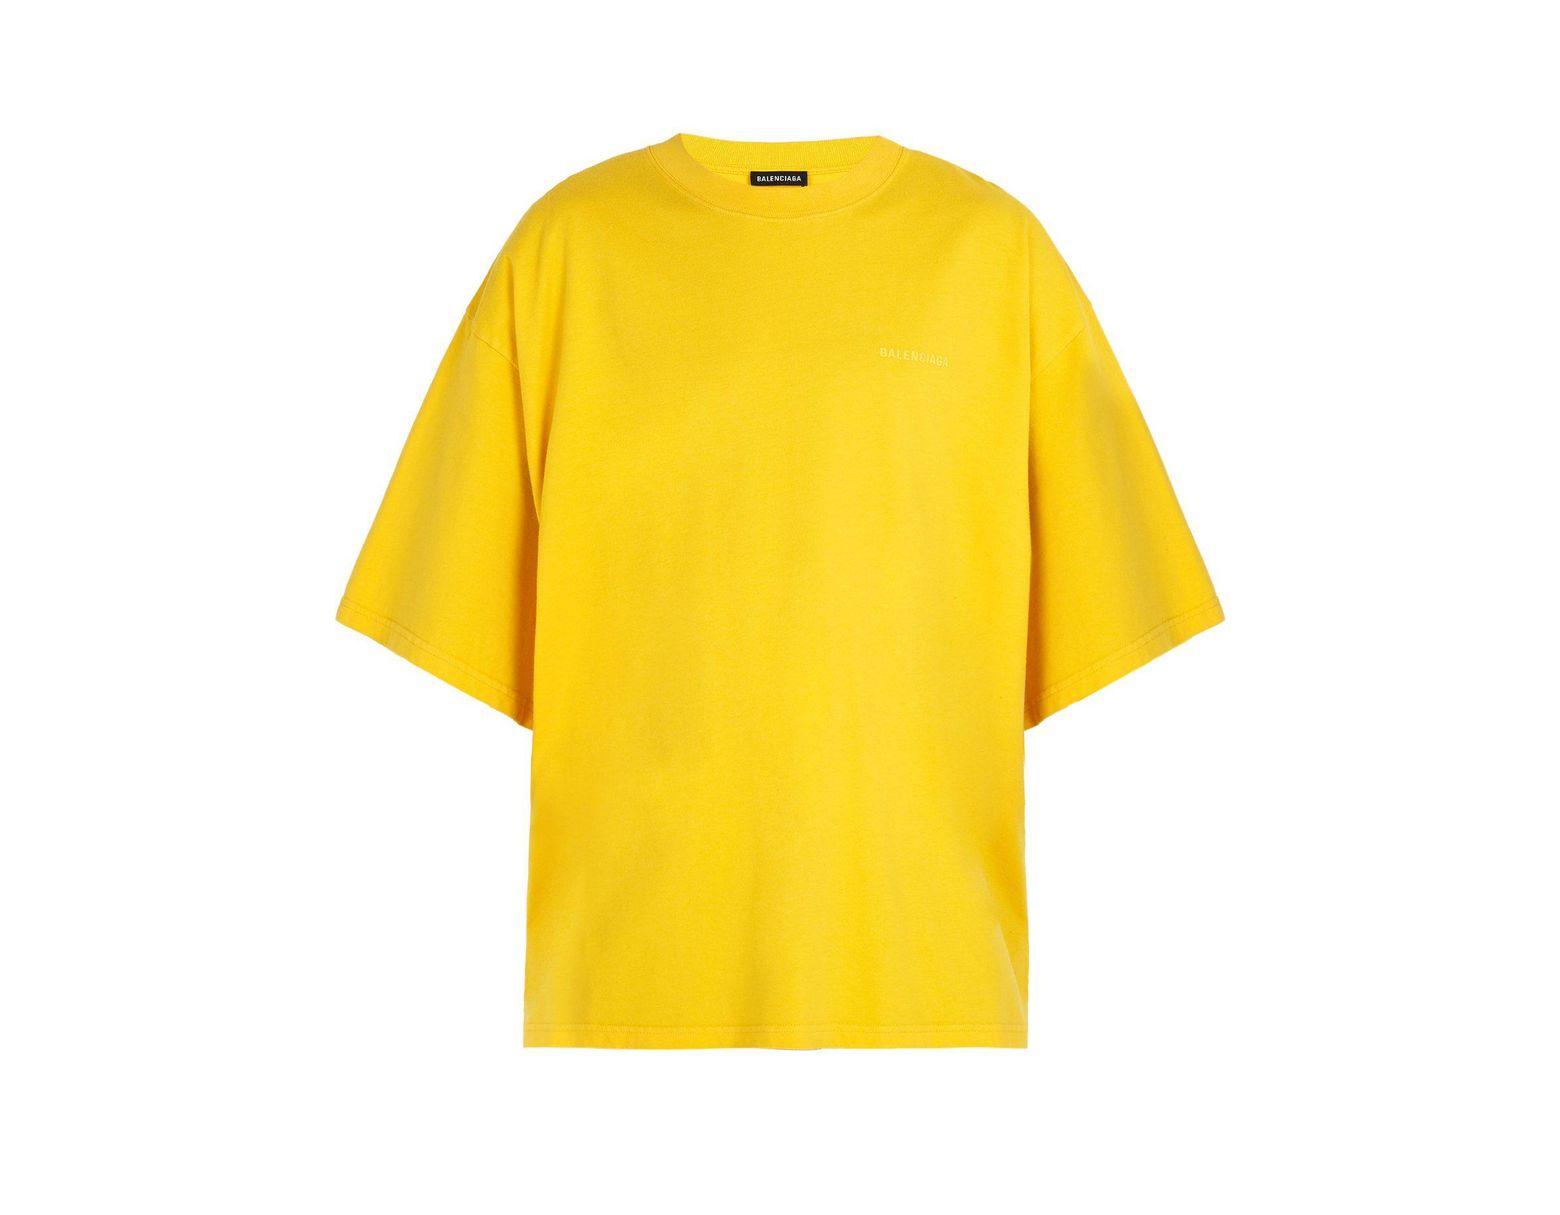 2f464d44 Balenciaga Self Help Print Cotton T Shirt in Yellow for Men - Lyst